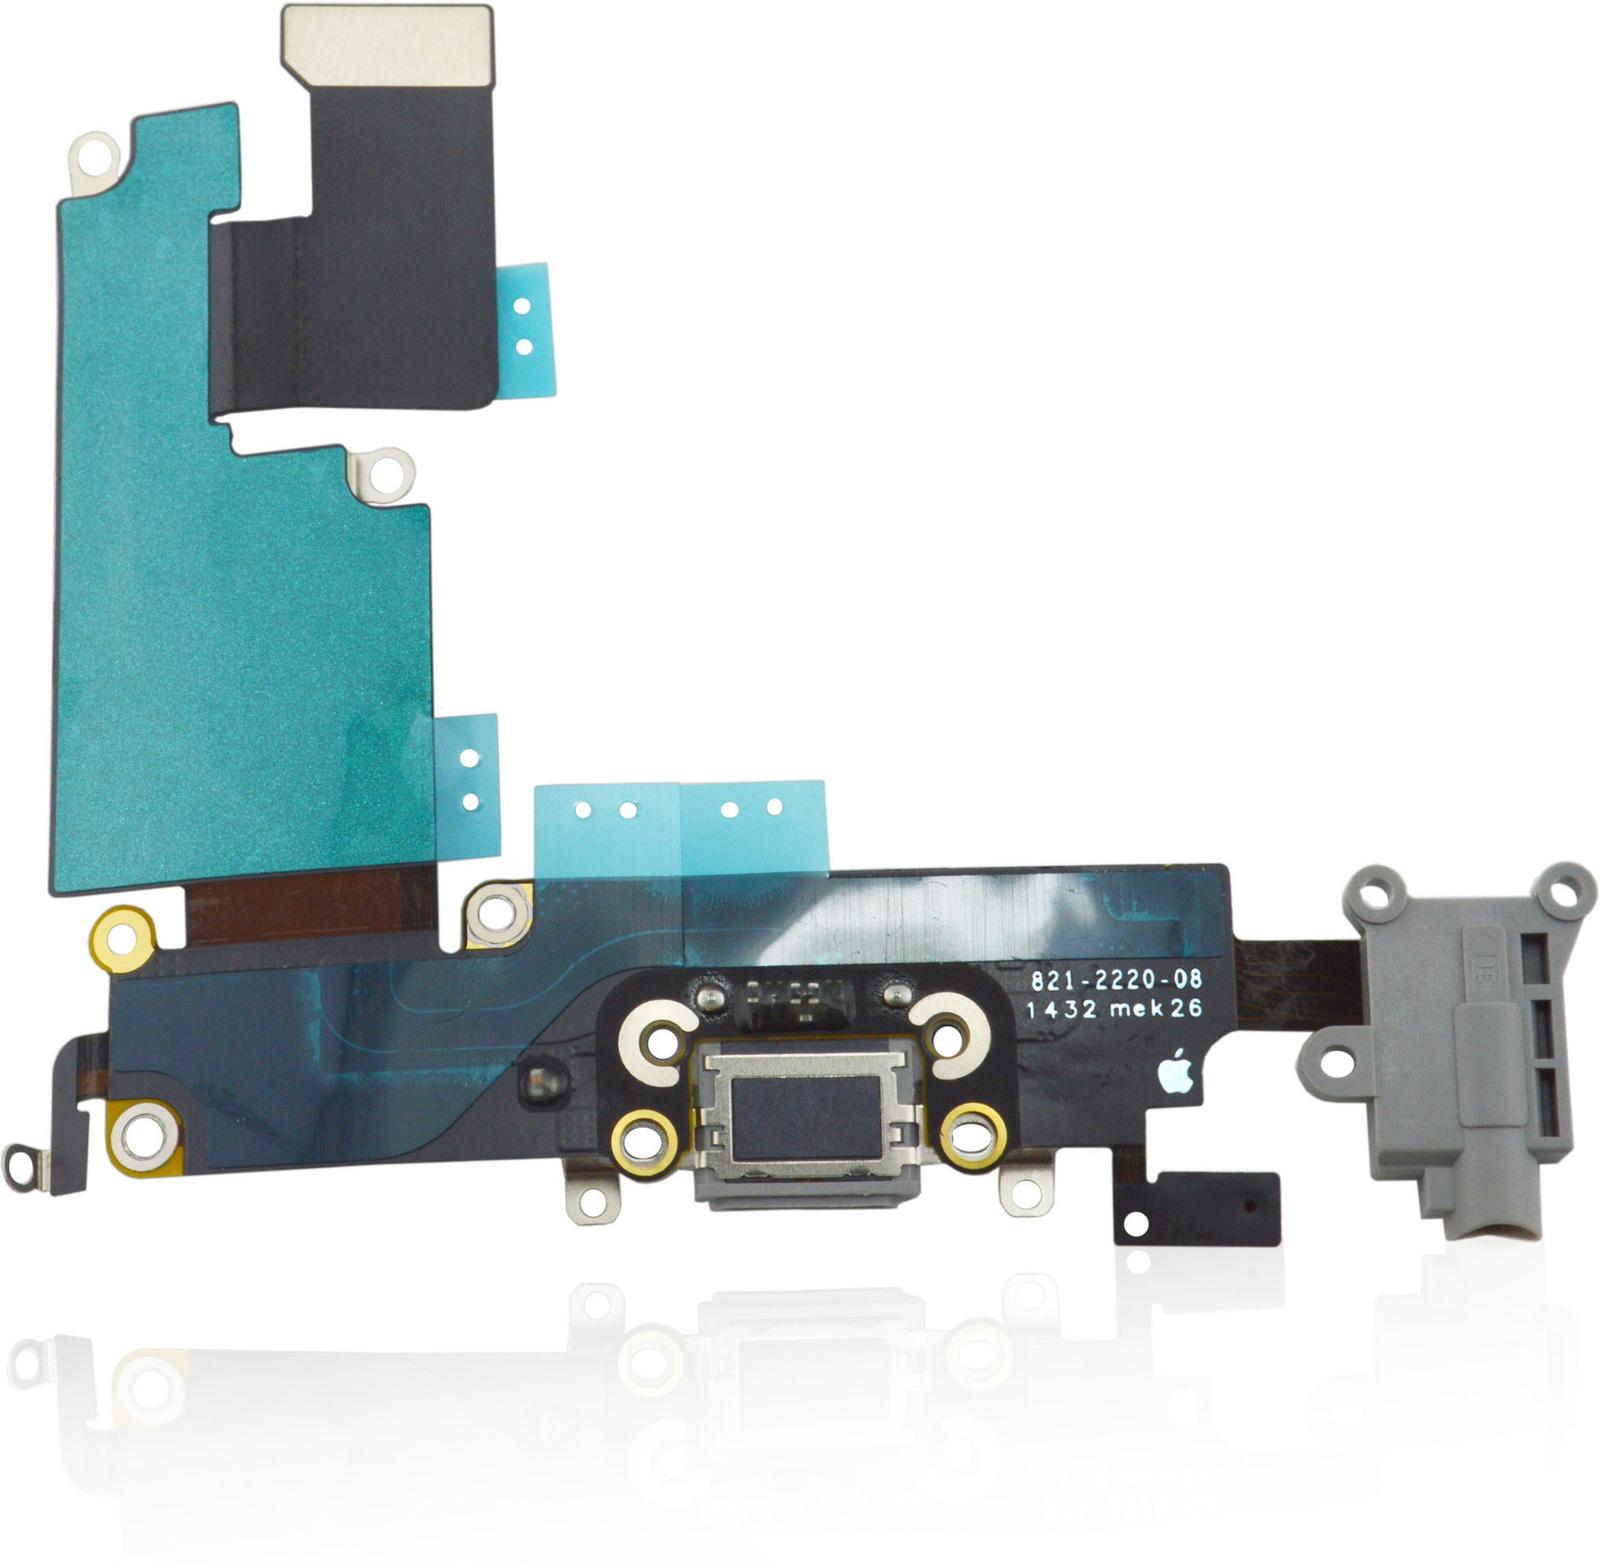 MicroSpareparts Mobile Apple iPhone 6 Plus Headphone Jack with Dock Connector Flex MSPP70001 - eet01